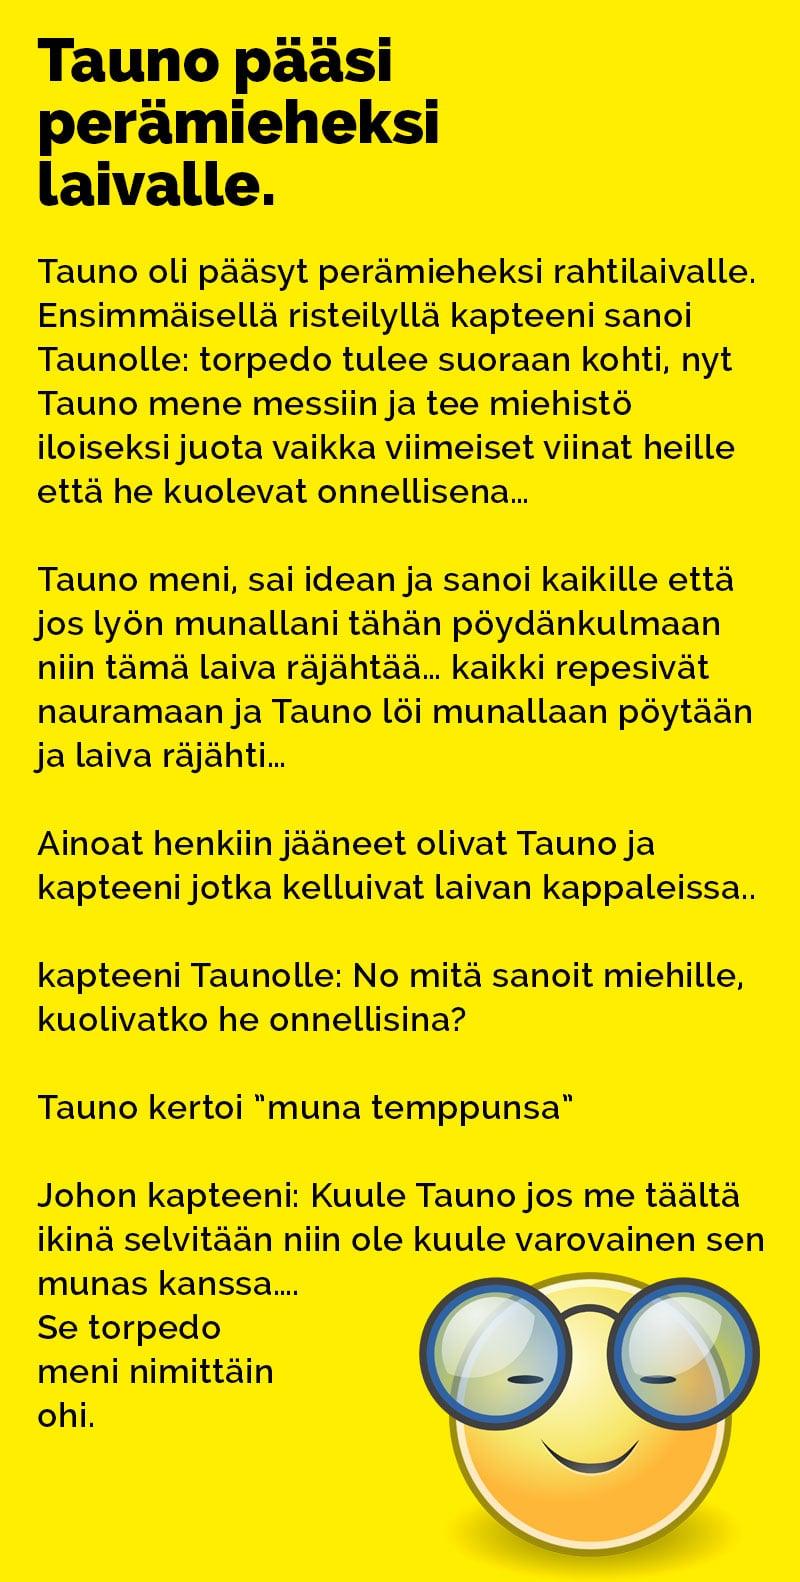 tauno_paasi_peramieheksi_2